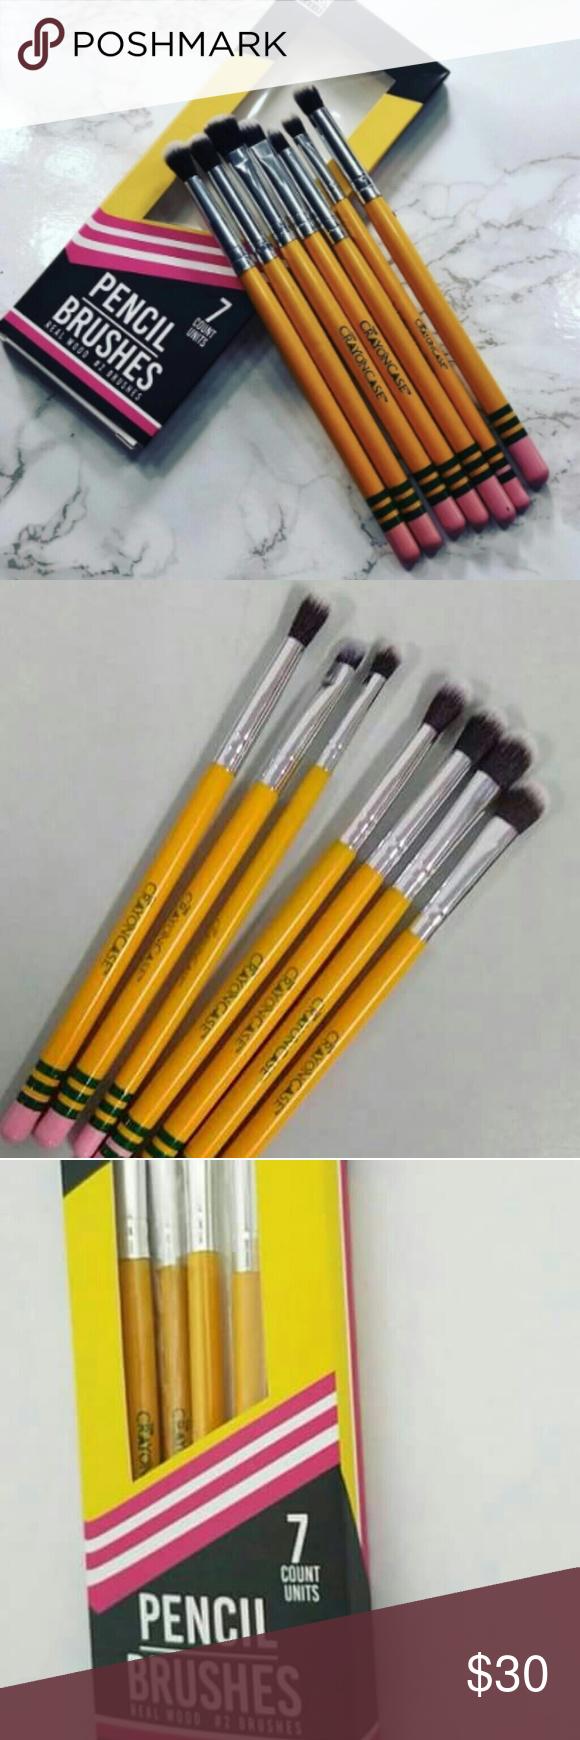 The Crayon Case Eye Pencil brushes 7 pieces BNIB NWT Eye